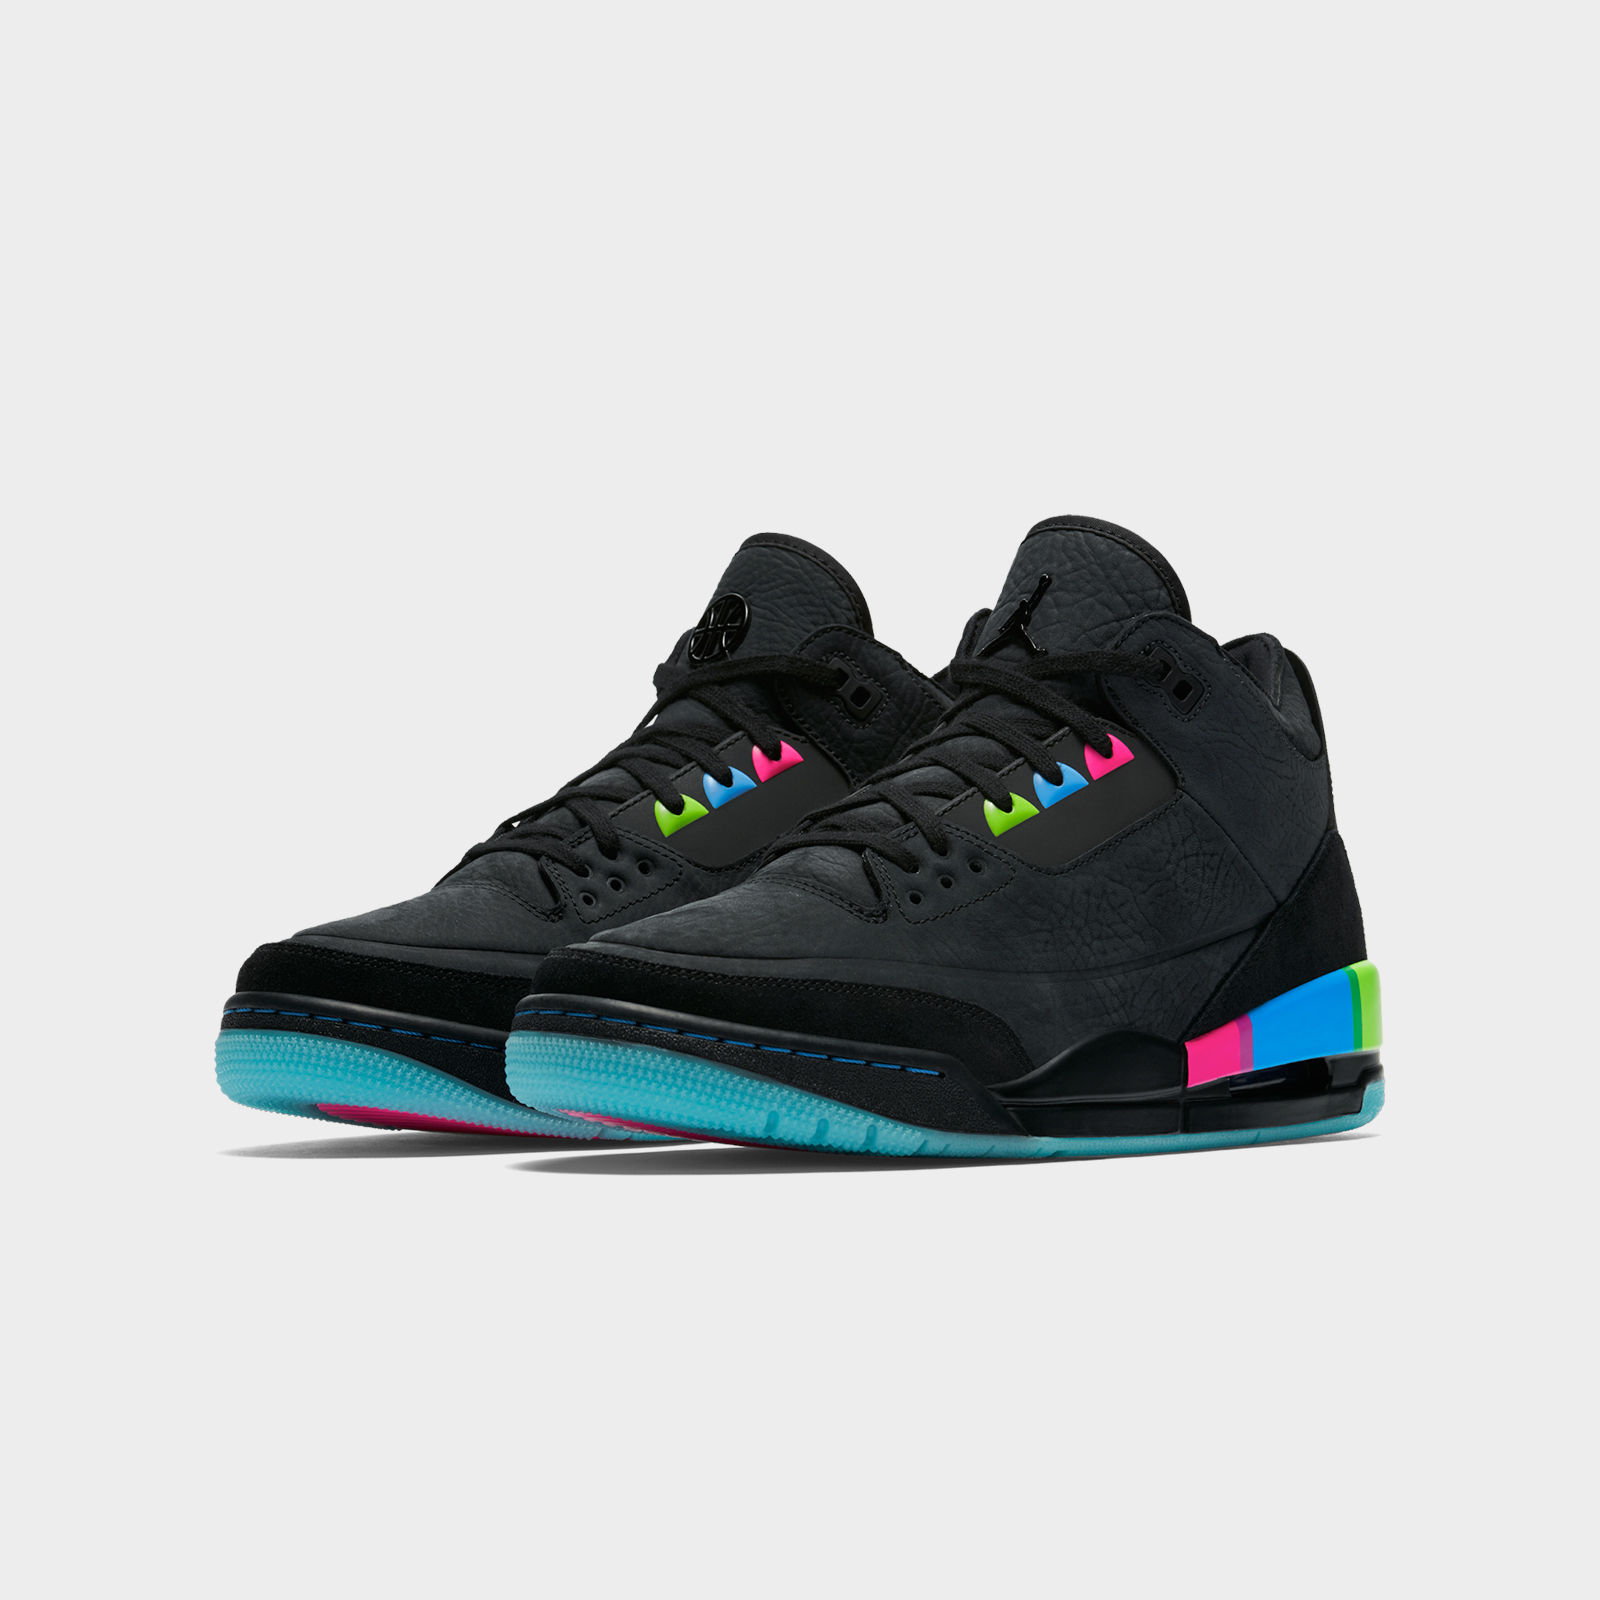 b590a52e9aa8ce Jordan Brand Air Jordan 3 Retro Se Q54 - At9195-001 - Sneakersnstuff ...